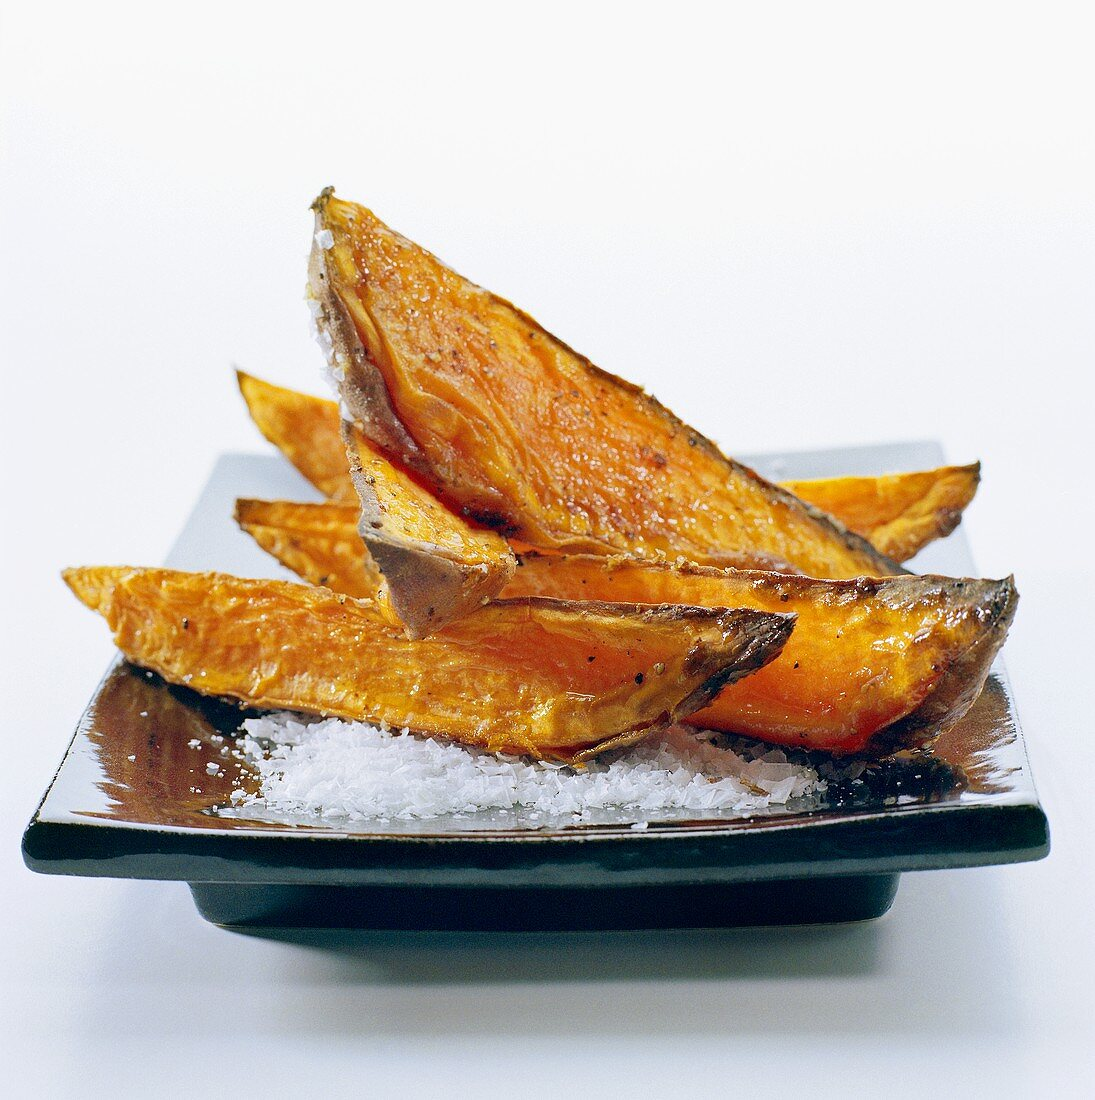 Sweet potato chips with salt